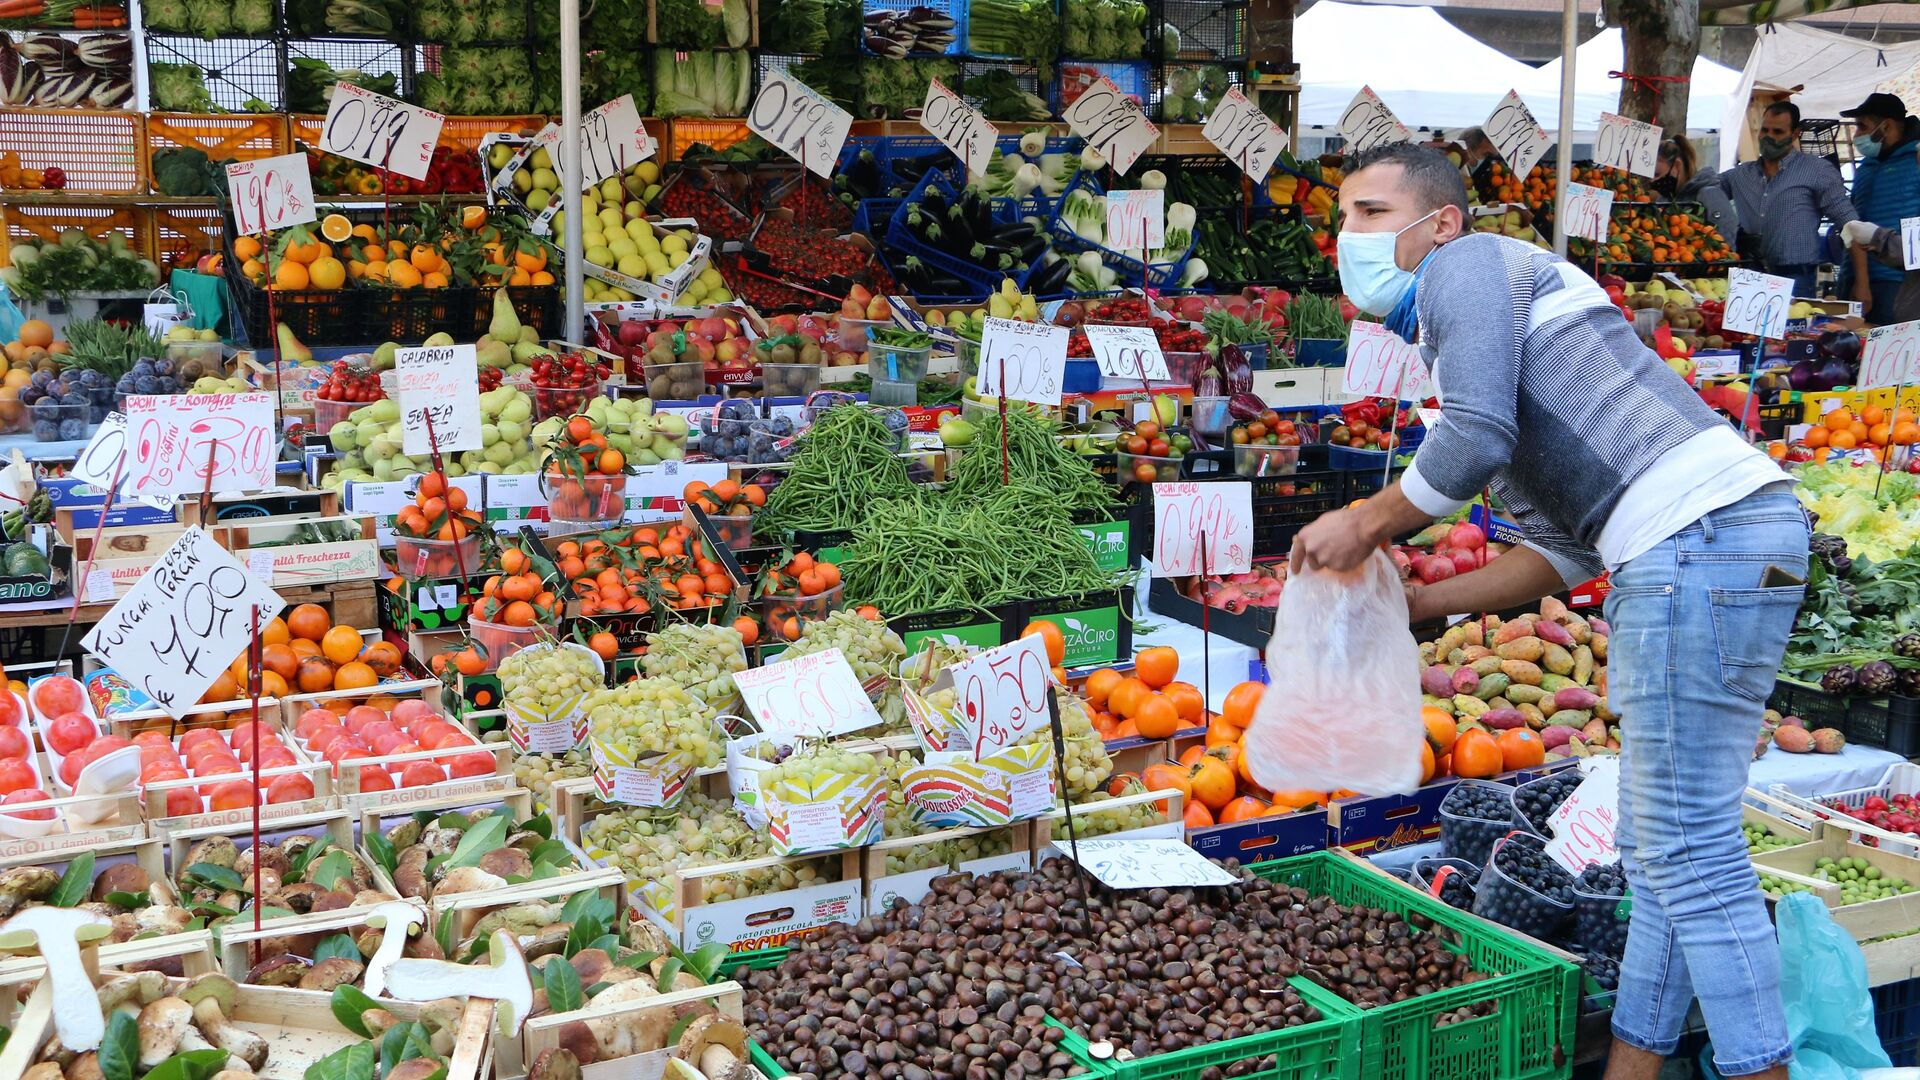 Mercato di frutta e verdura - Sputnik Italia, 1920, 21.05.2021